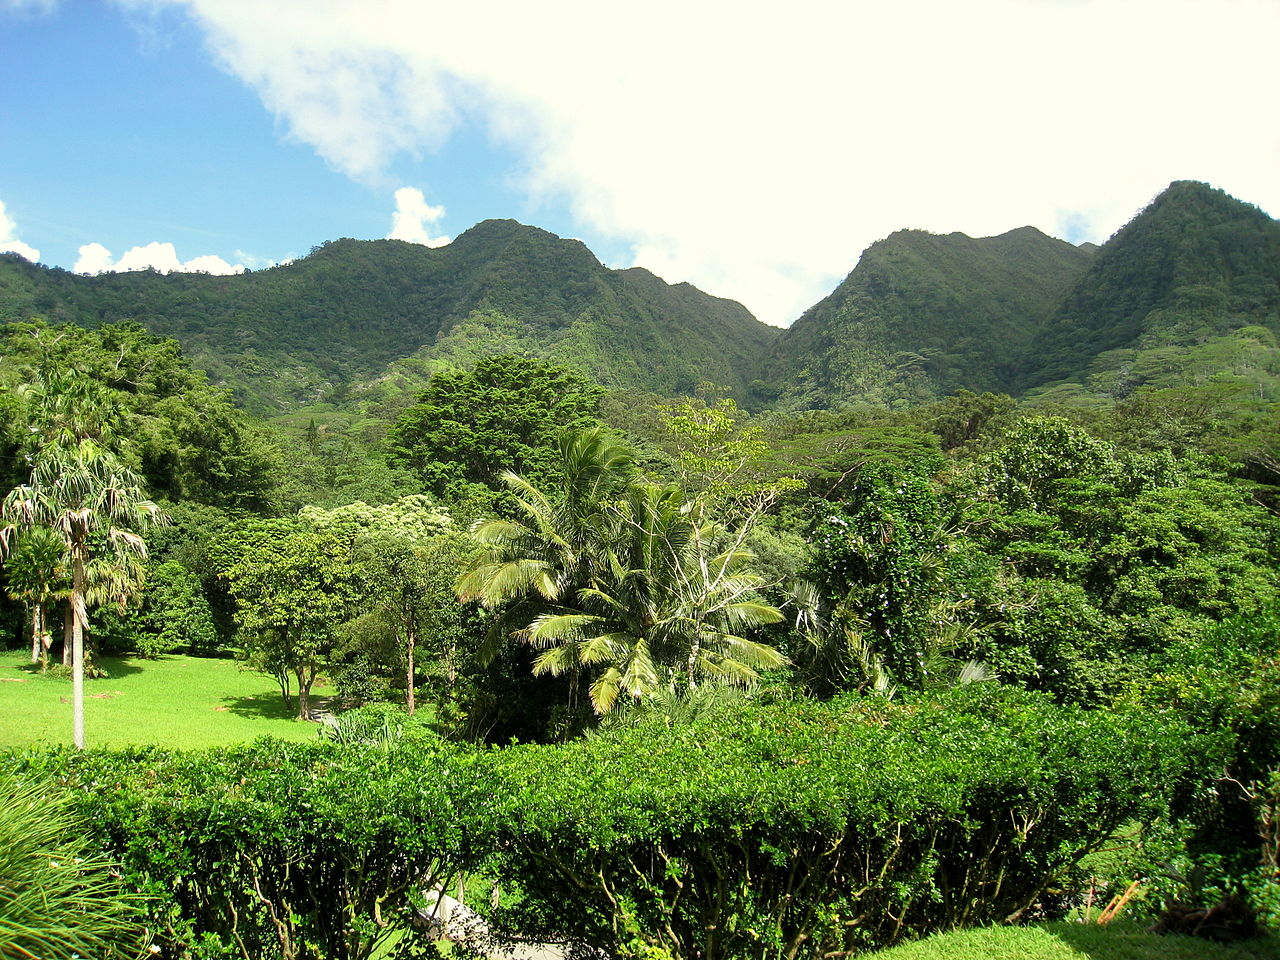 1280px-Lyon_Arboretum,_Oahu,_Hawaii_-_general_view